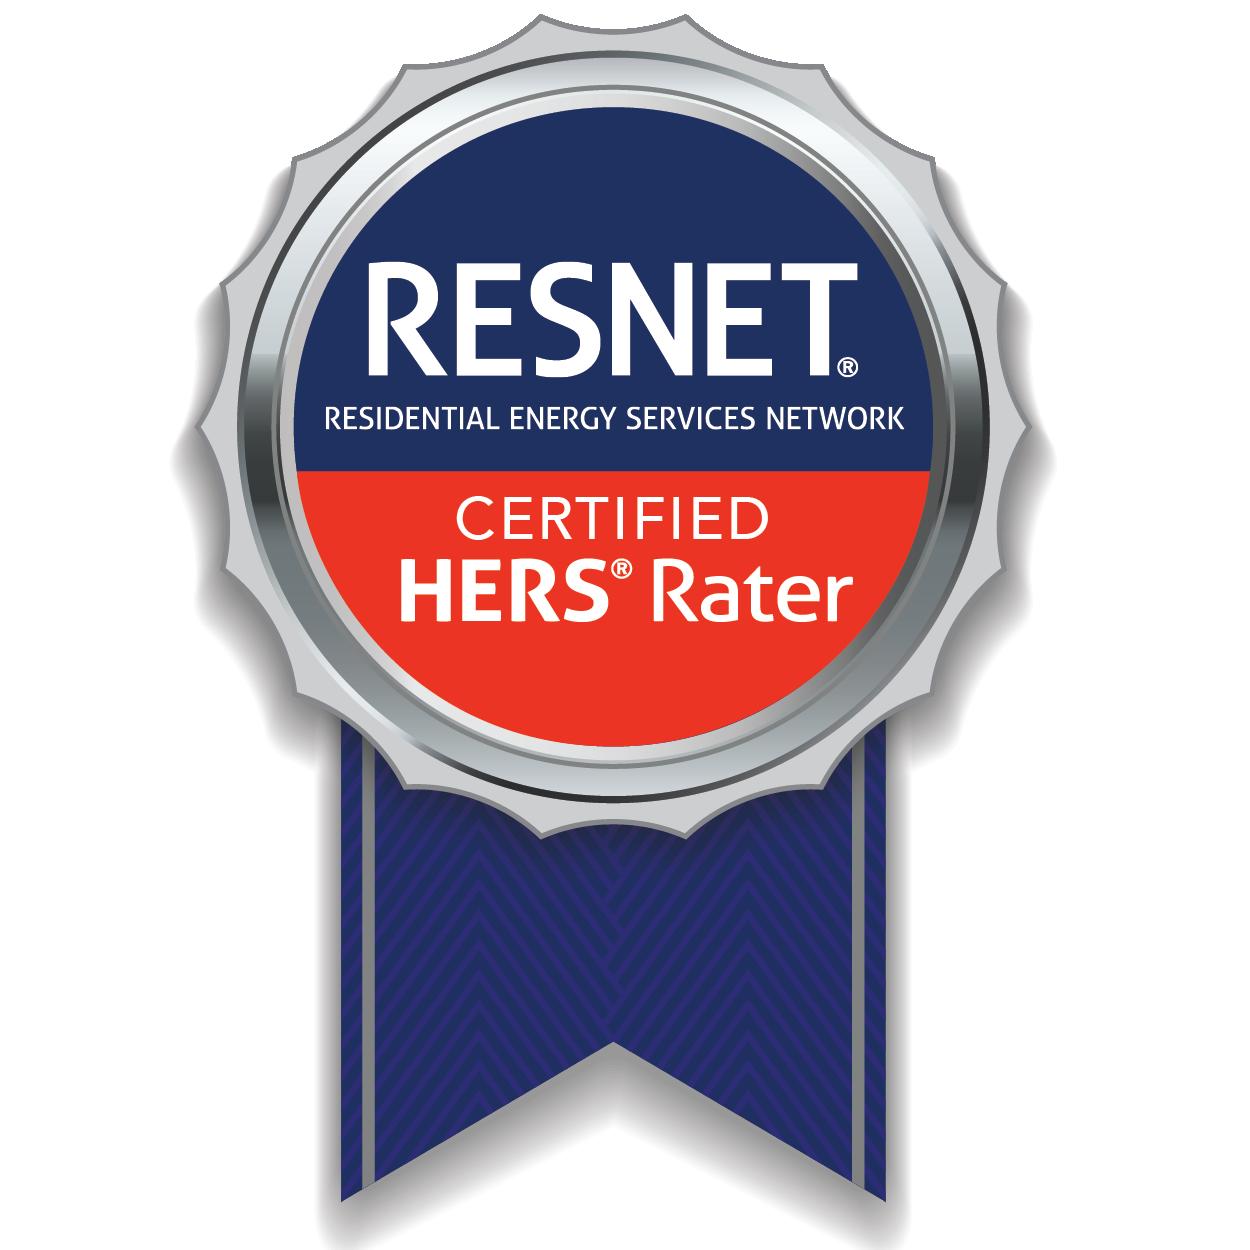 The RESNET badge